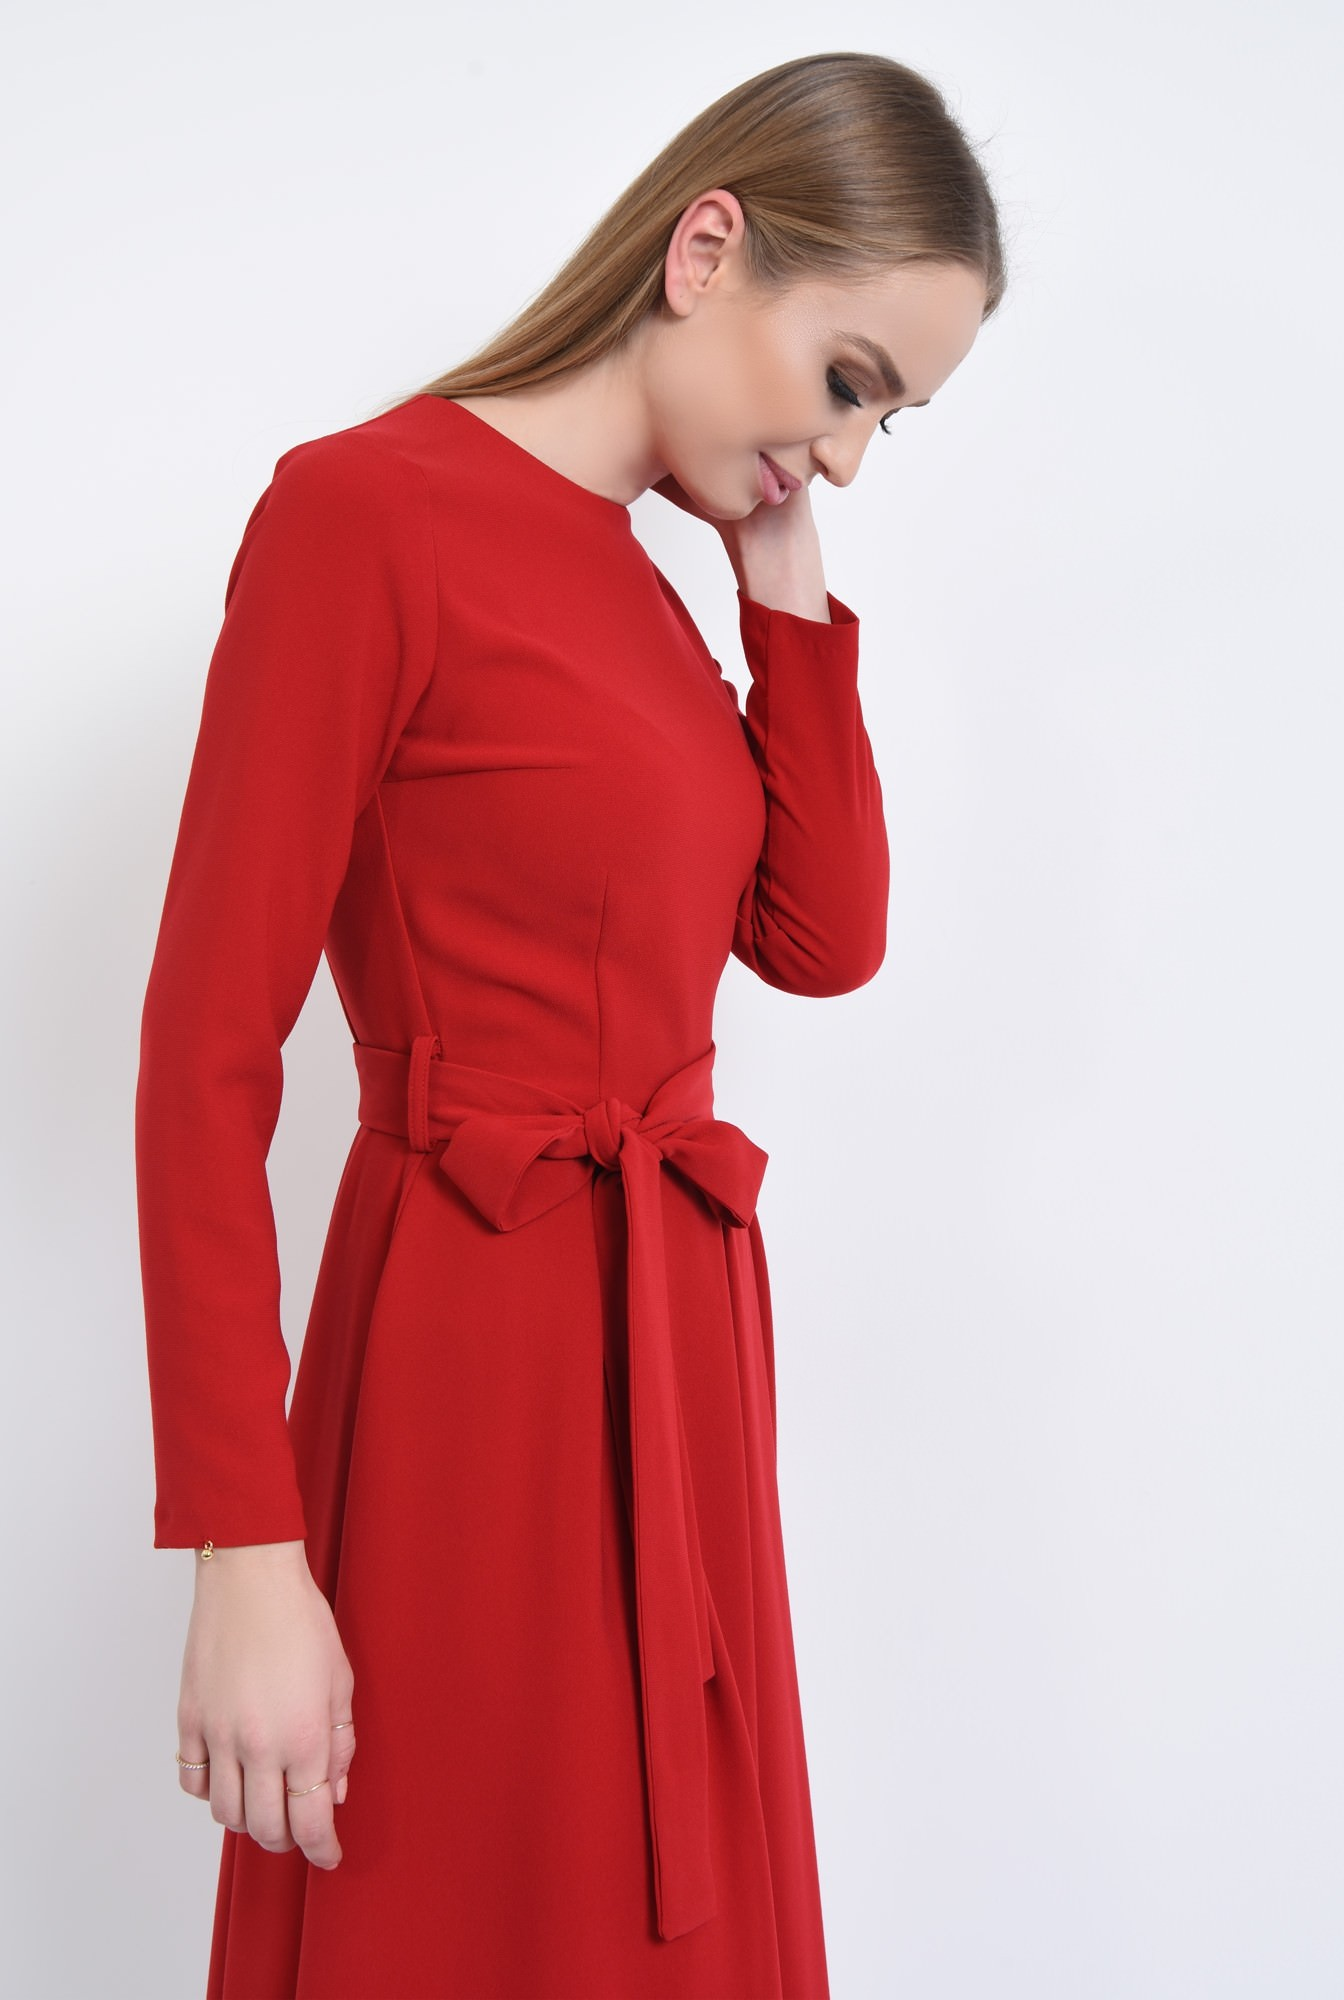 2 - rochie casual, midi, plisata, cordon, rosu